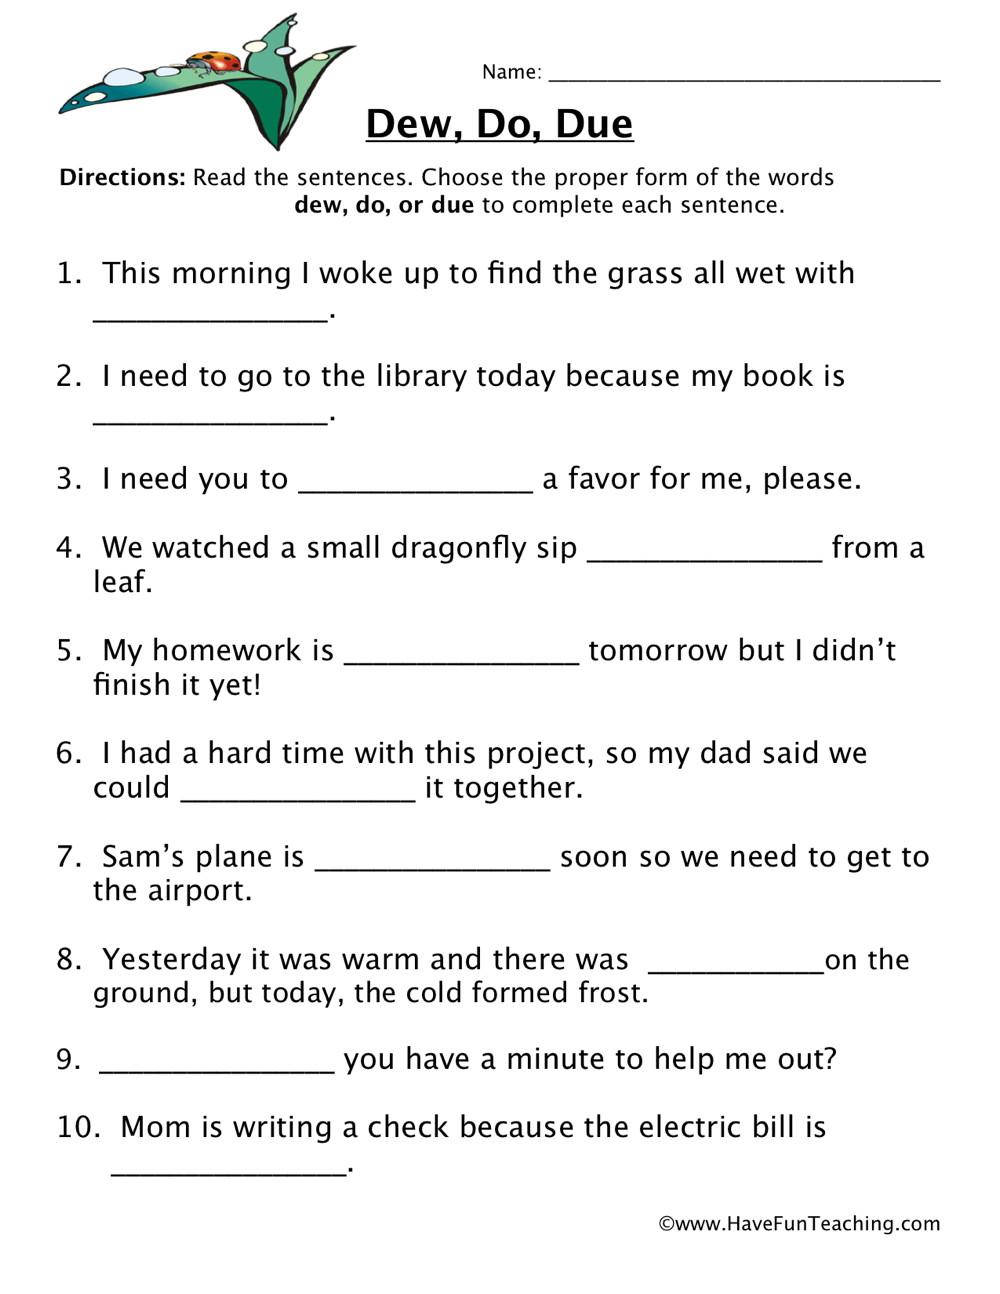 Homophones Worksheets 4th Grade Dew Do Due Homophones Worksheet